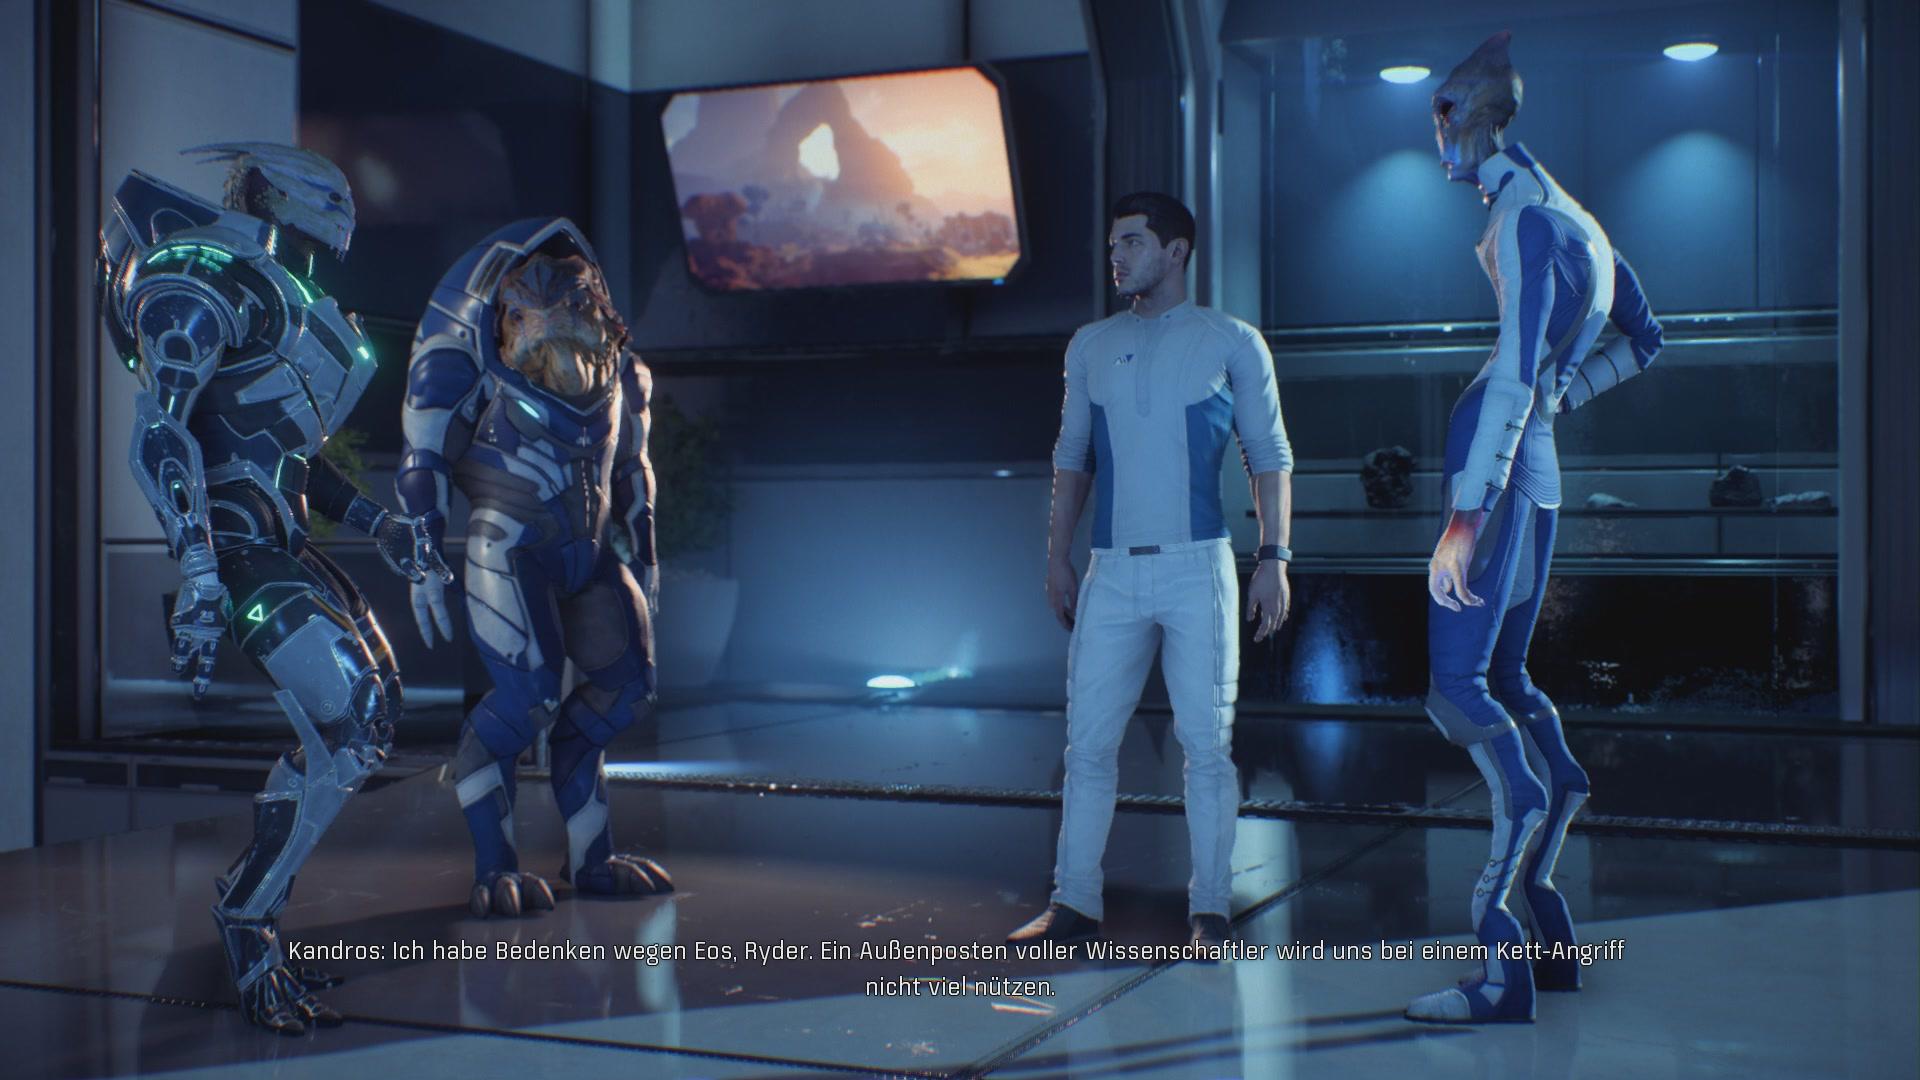 Mass Effect Andromeda Komplettlösung Eine Hoffnungvolle Spur Den